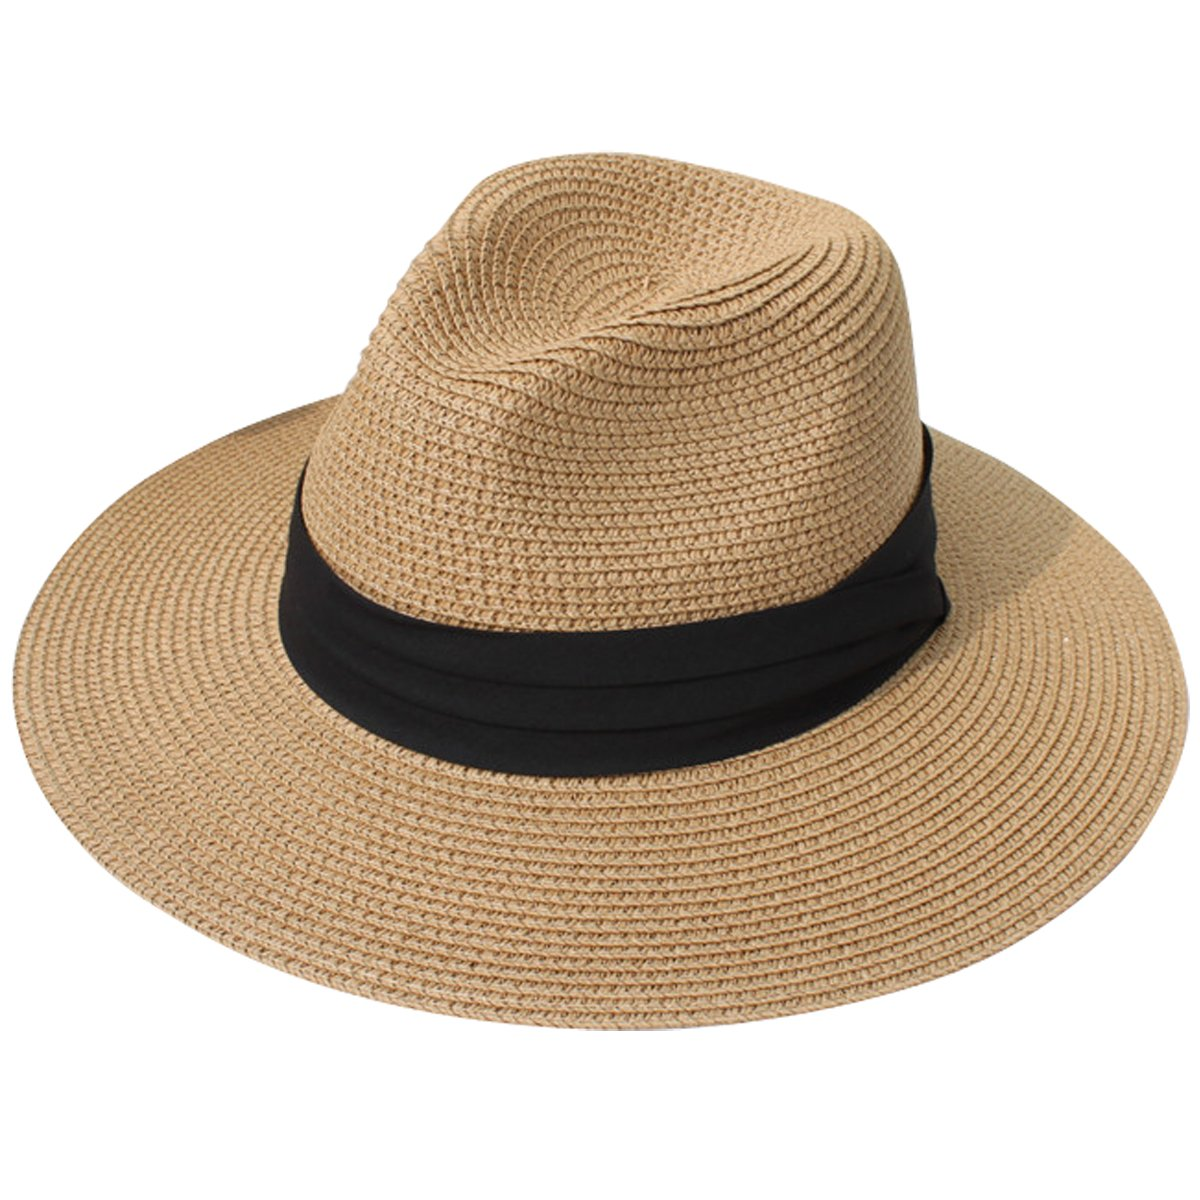 Lanzom Women Wide Brim Straw Panama Roll up Hat Fedora Beach Sun Hat UPF50+